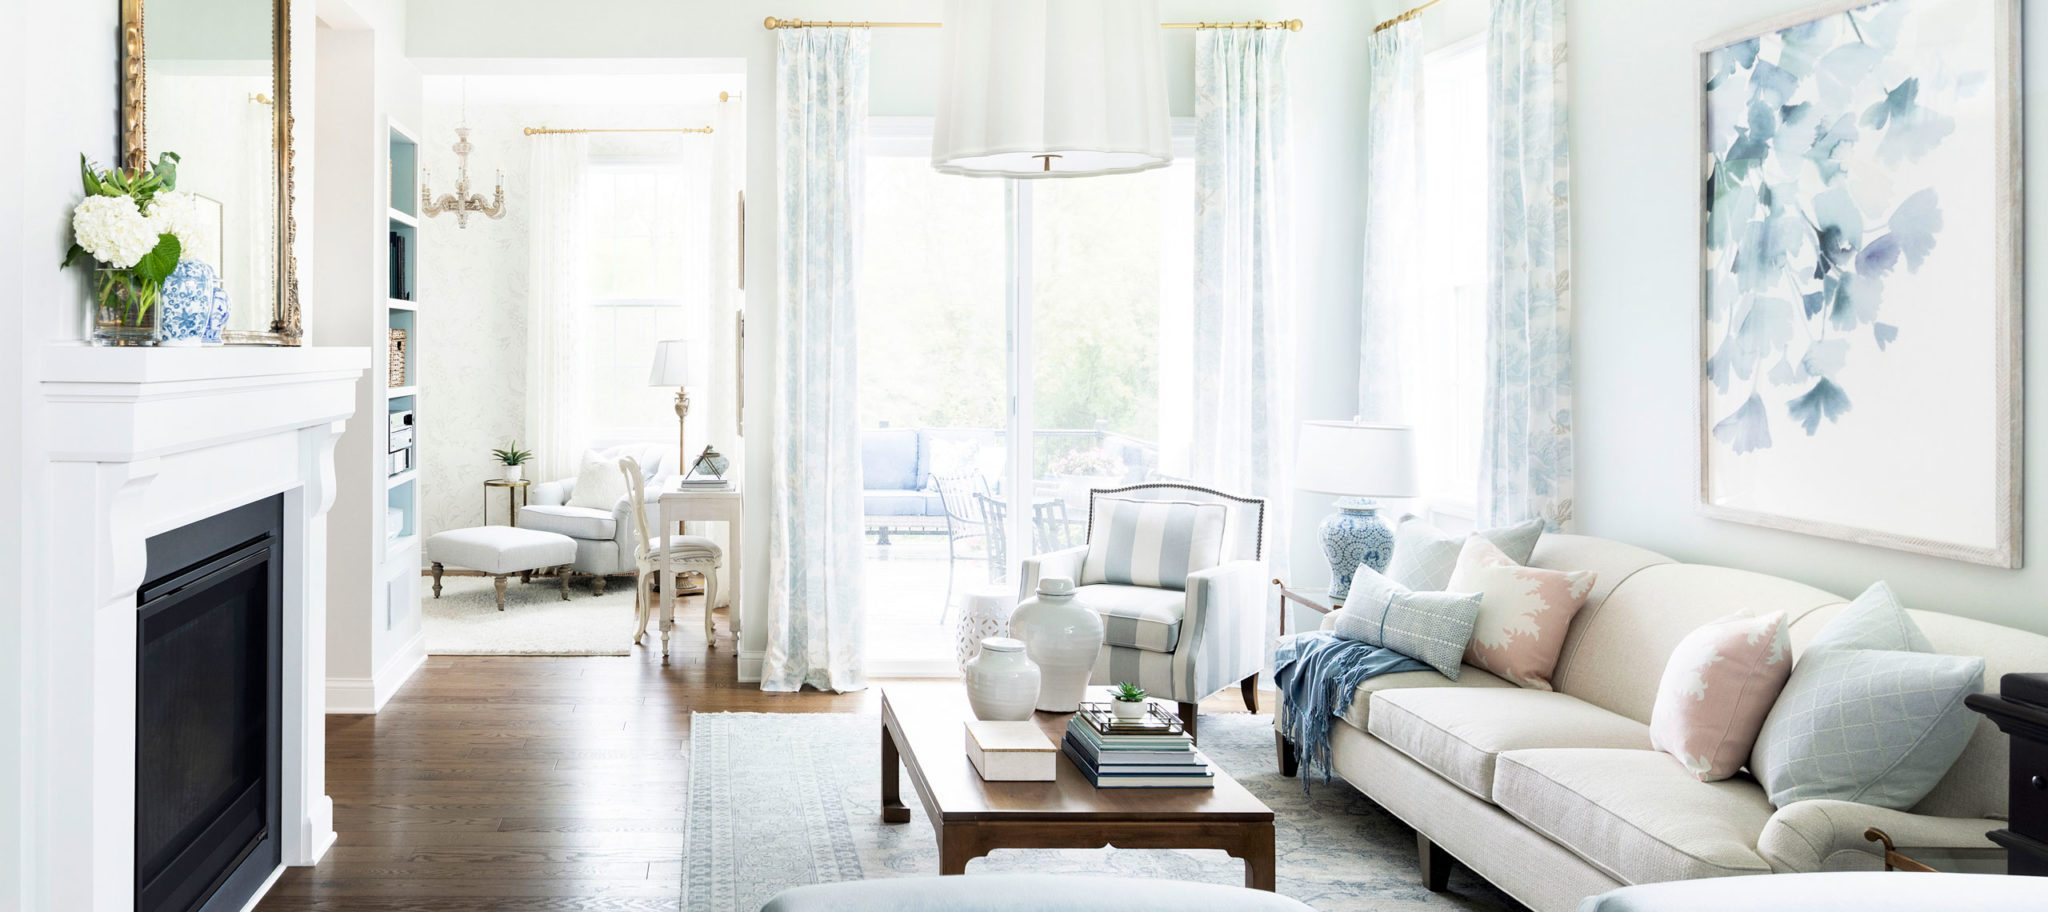 Bria Hammel Interiors A Minnesota Based Interior Design Firm